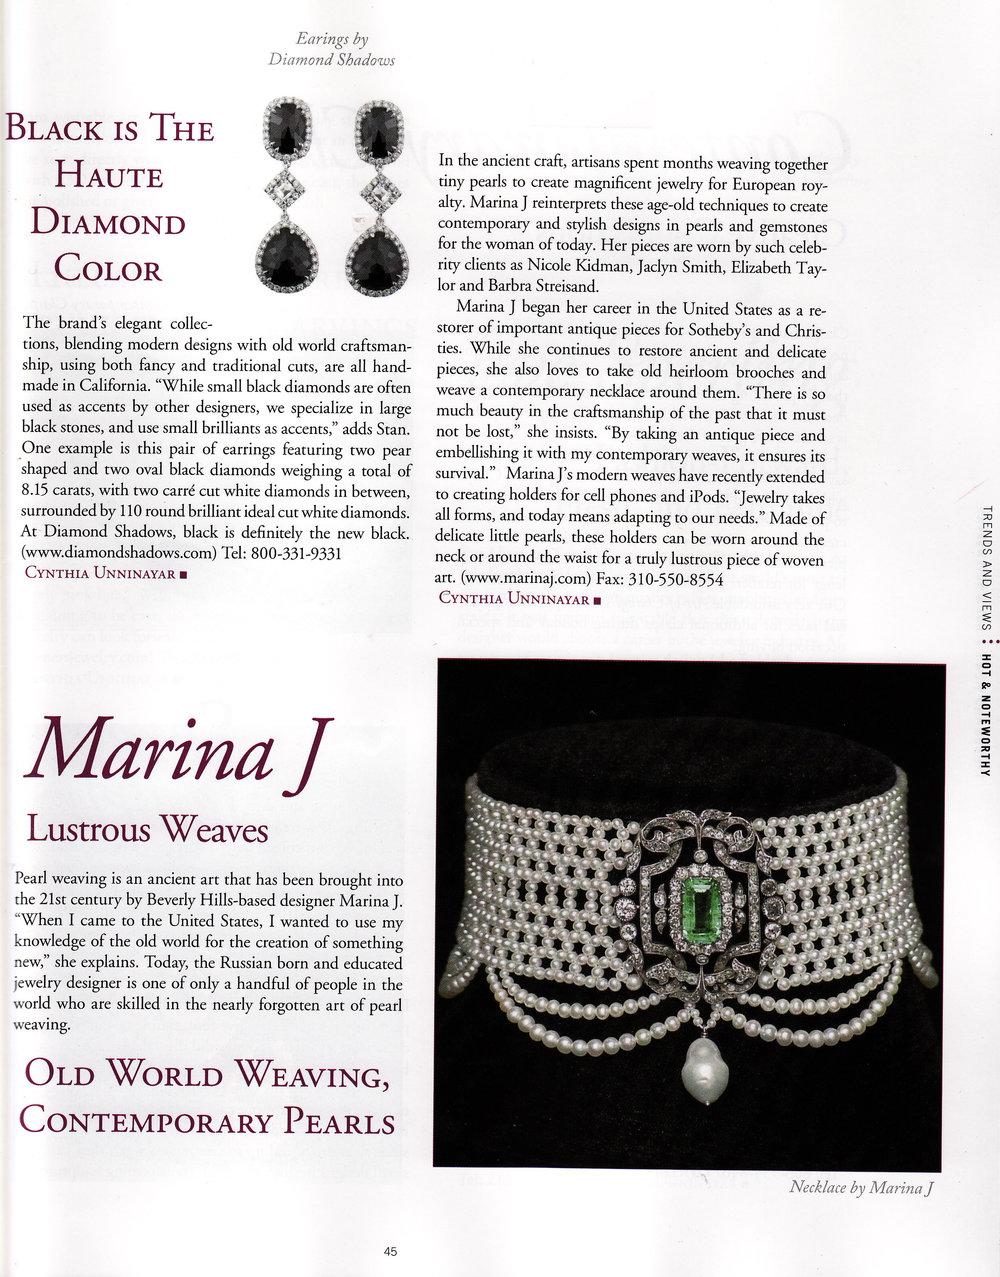 The Jewelry Book Winter 2009 Tear Sheet.jpg